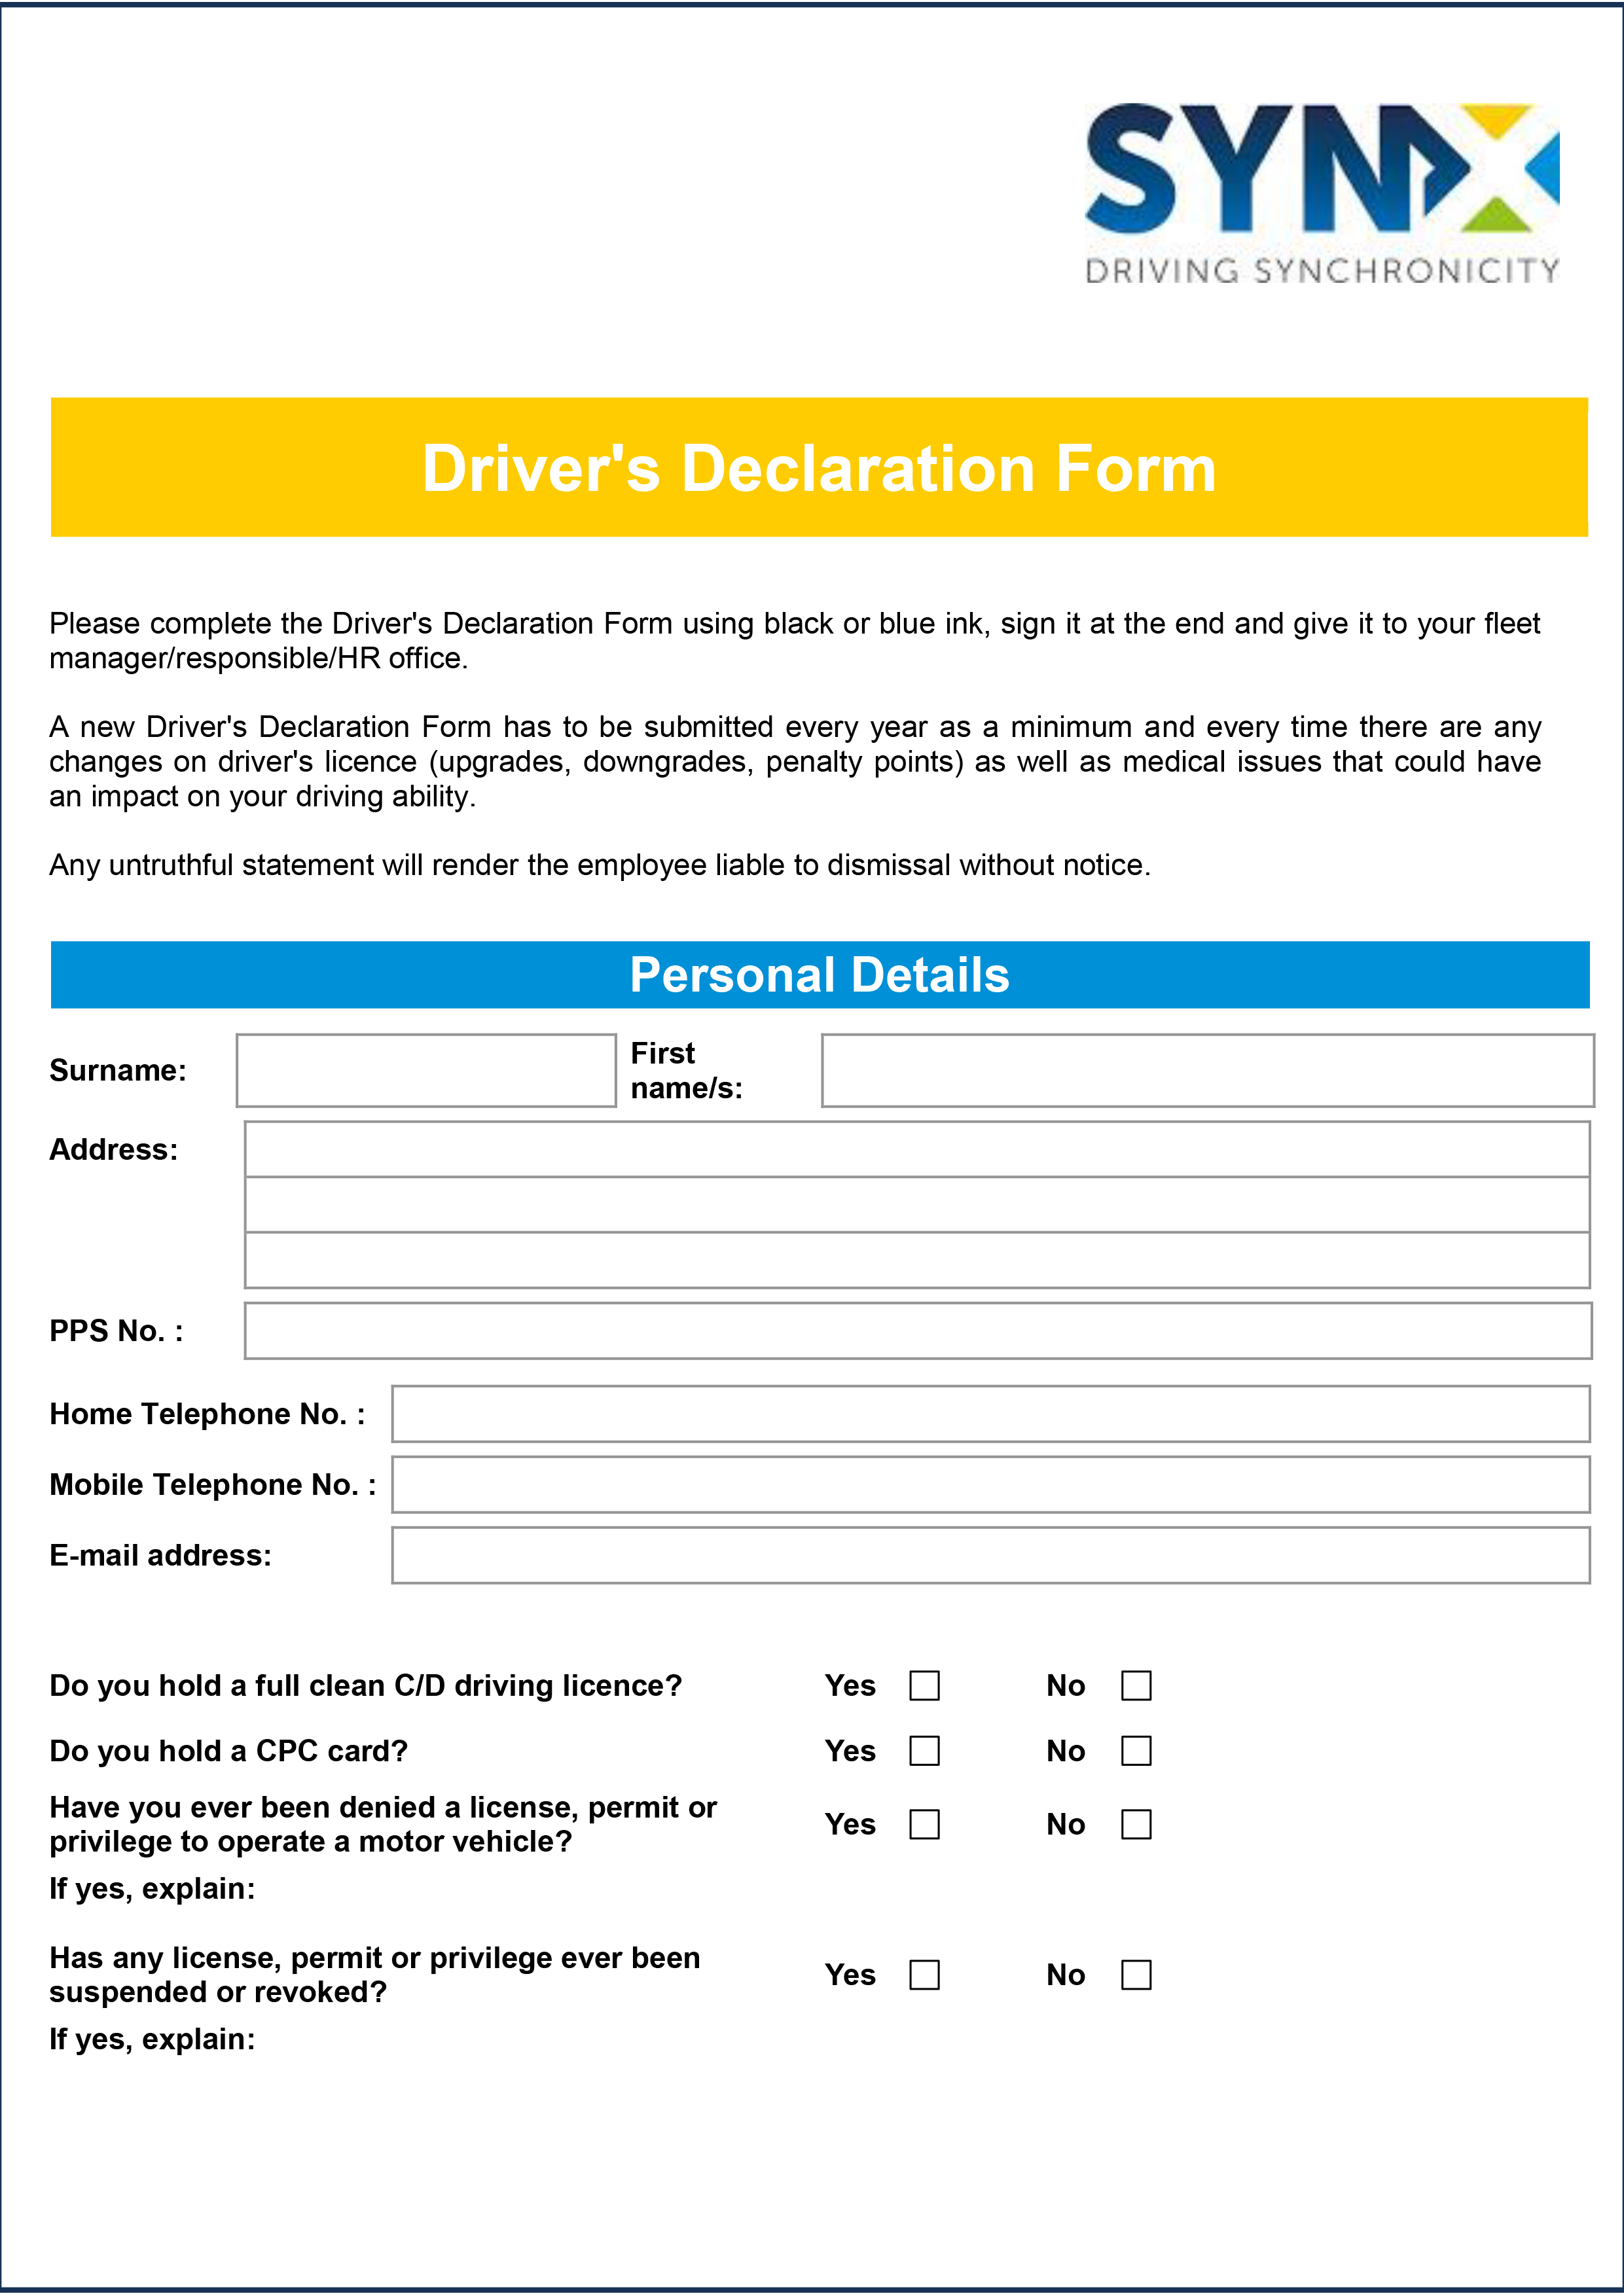 Drivers_declaration_form-1.png